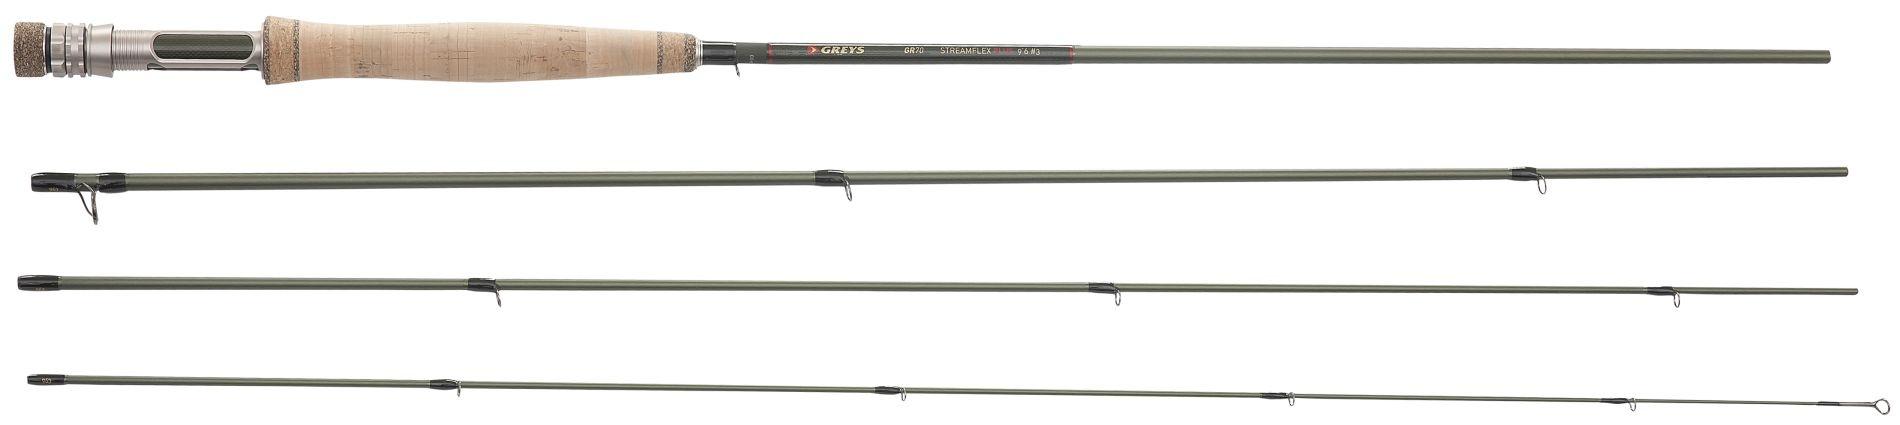 Muškařský prut Greys GR70 Streamflex Plus 2,90m #4